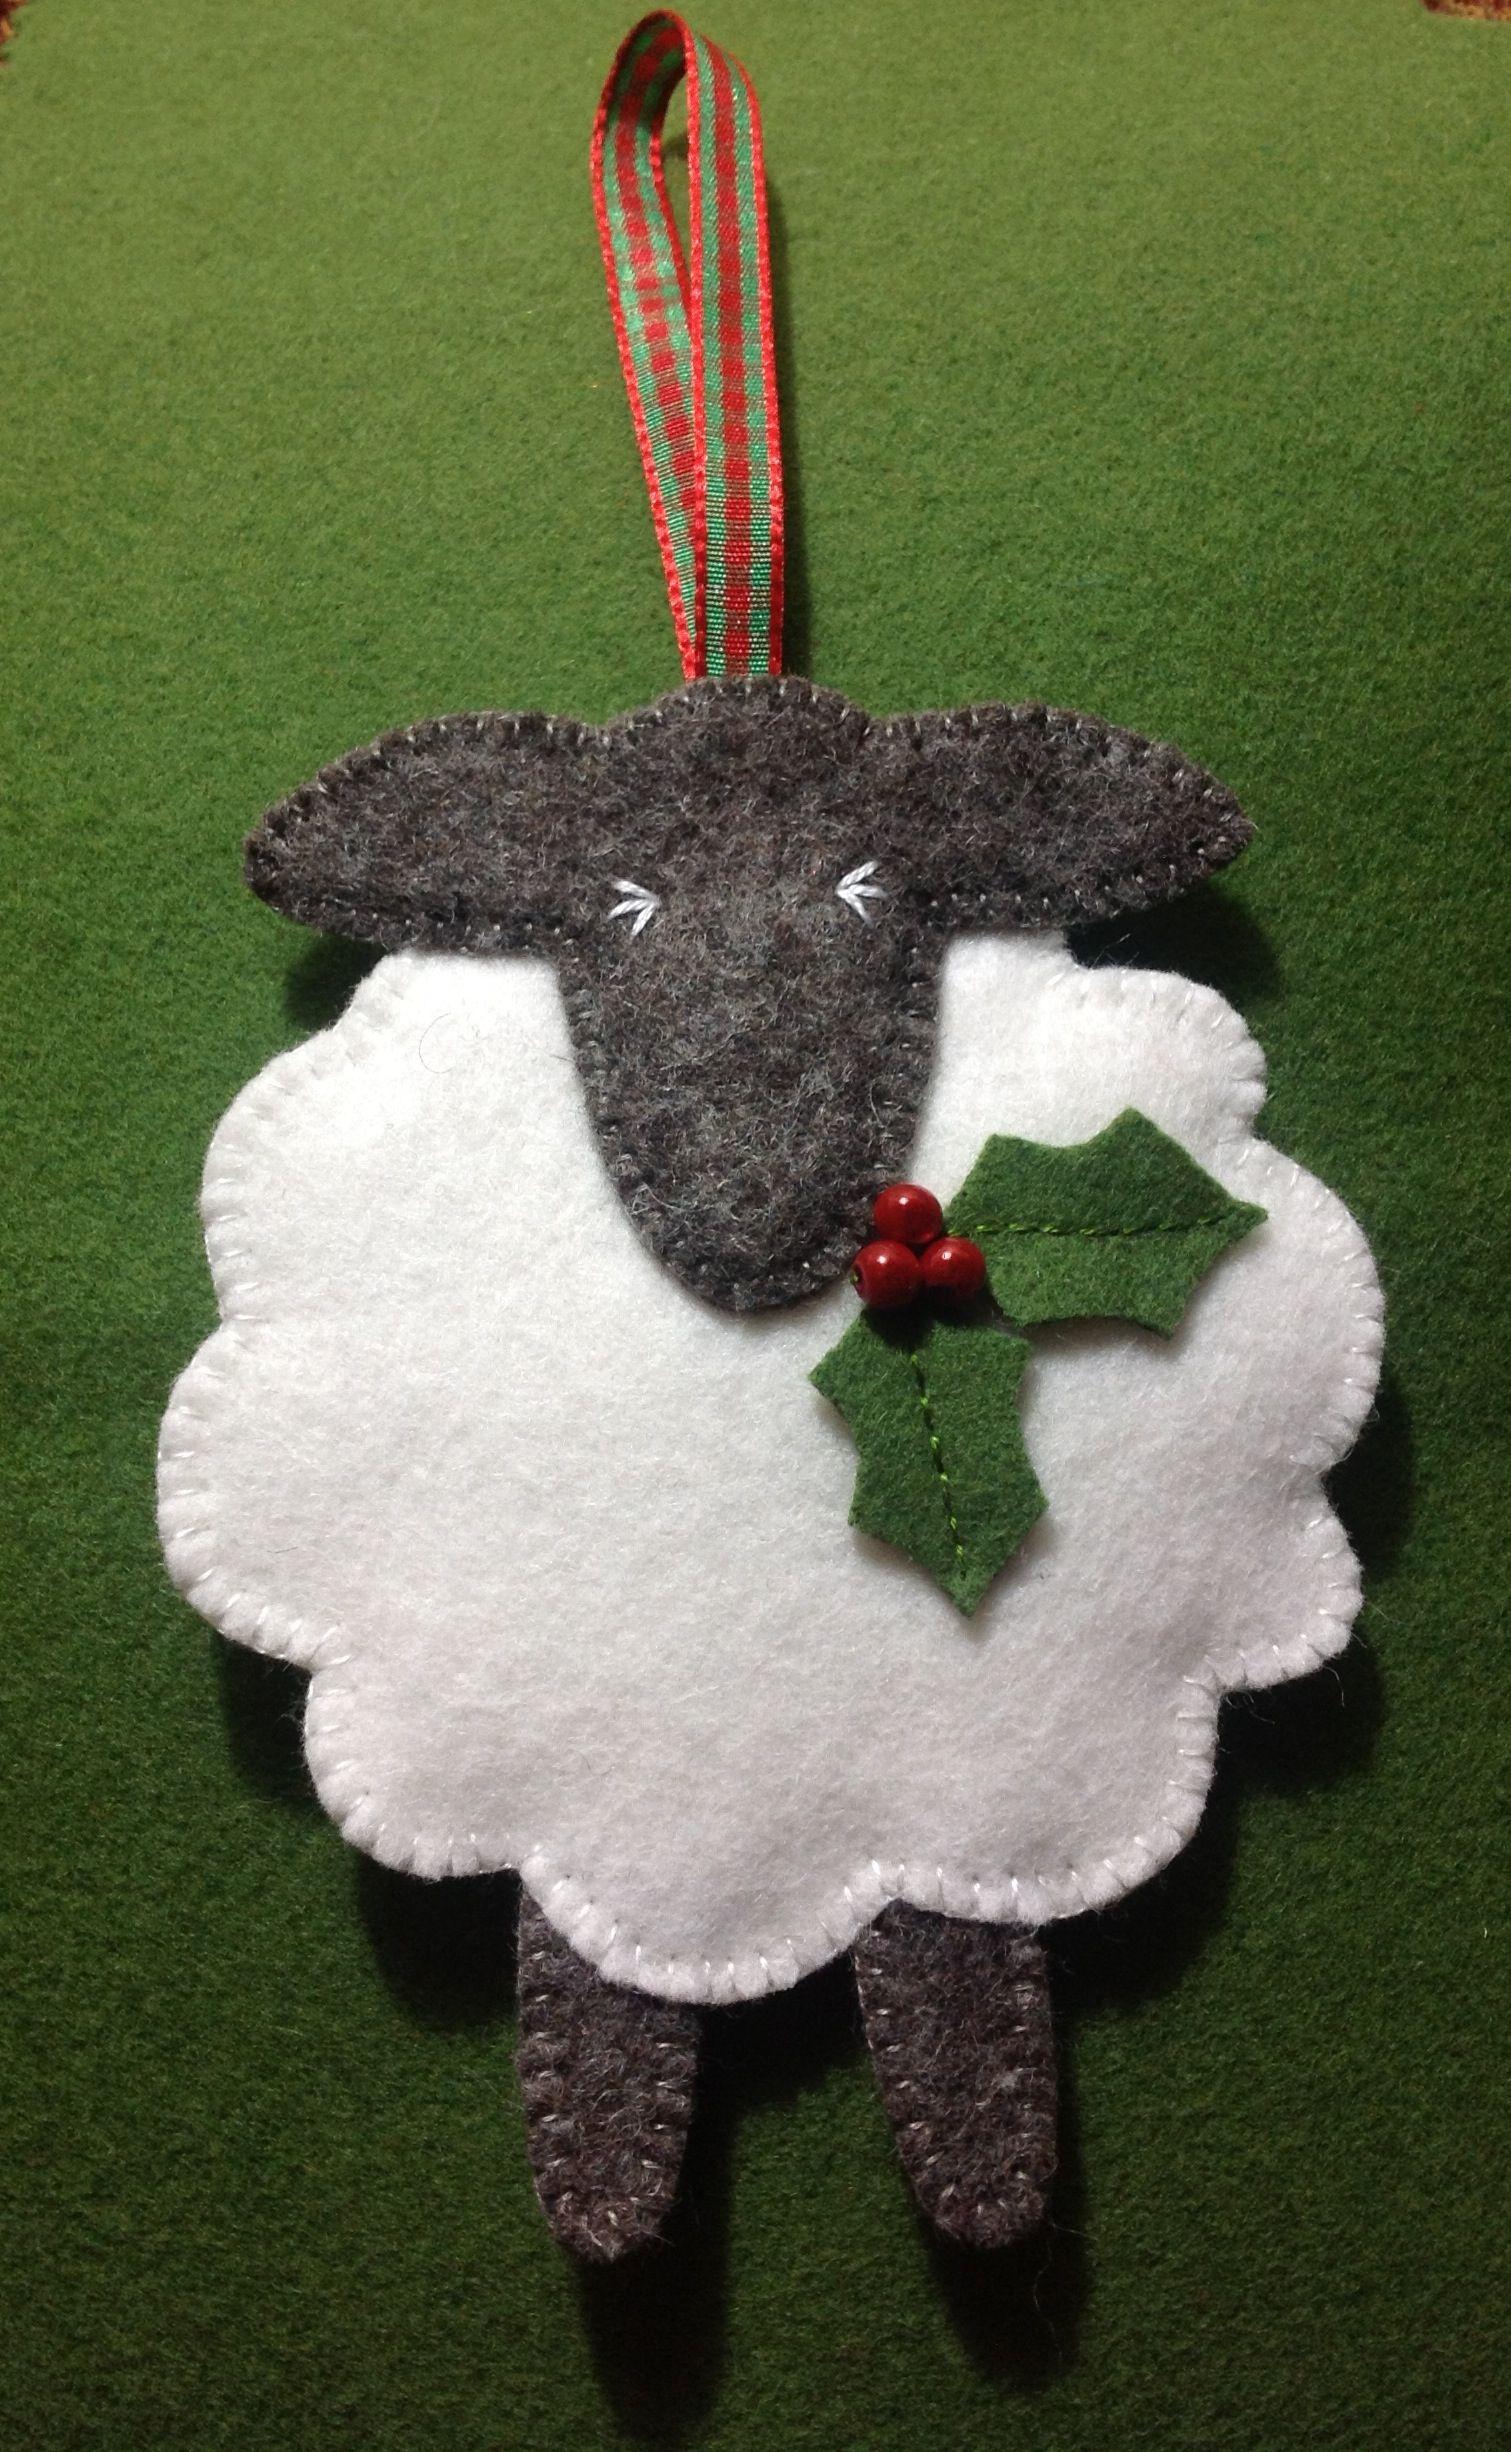 10 Minute Holiday Decorating Ideas Doityourself Com Felt Christmas Ornaments Christmas Crafts Christmas Ornaments